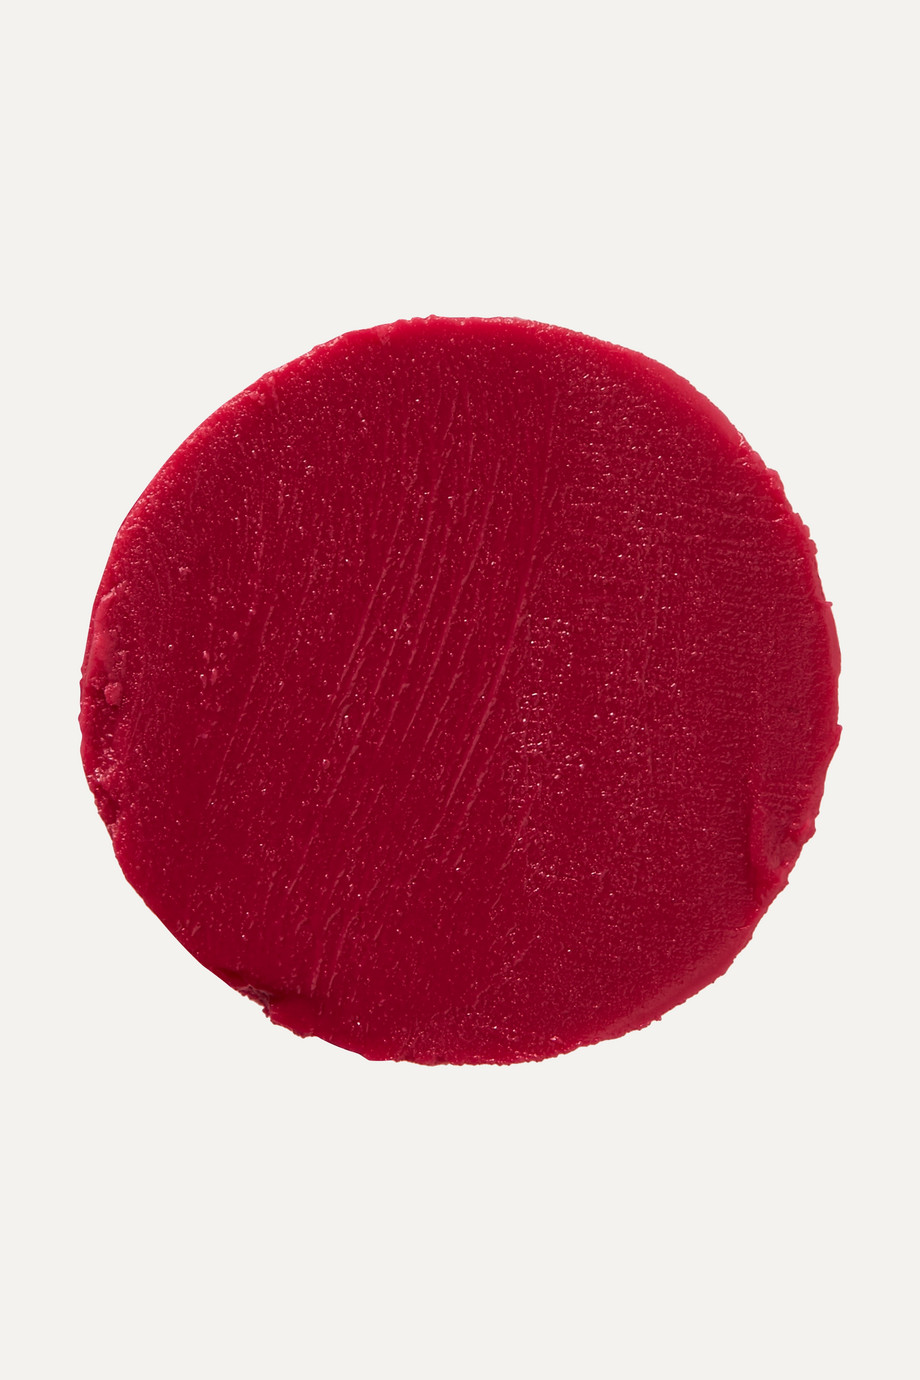 Lipstick Queen Saint Lipstick – Bright Berry – Lippenstift